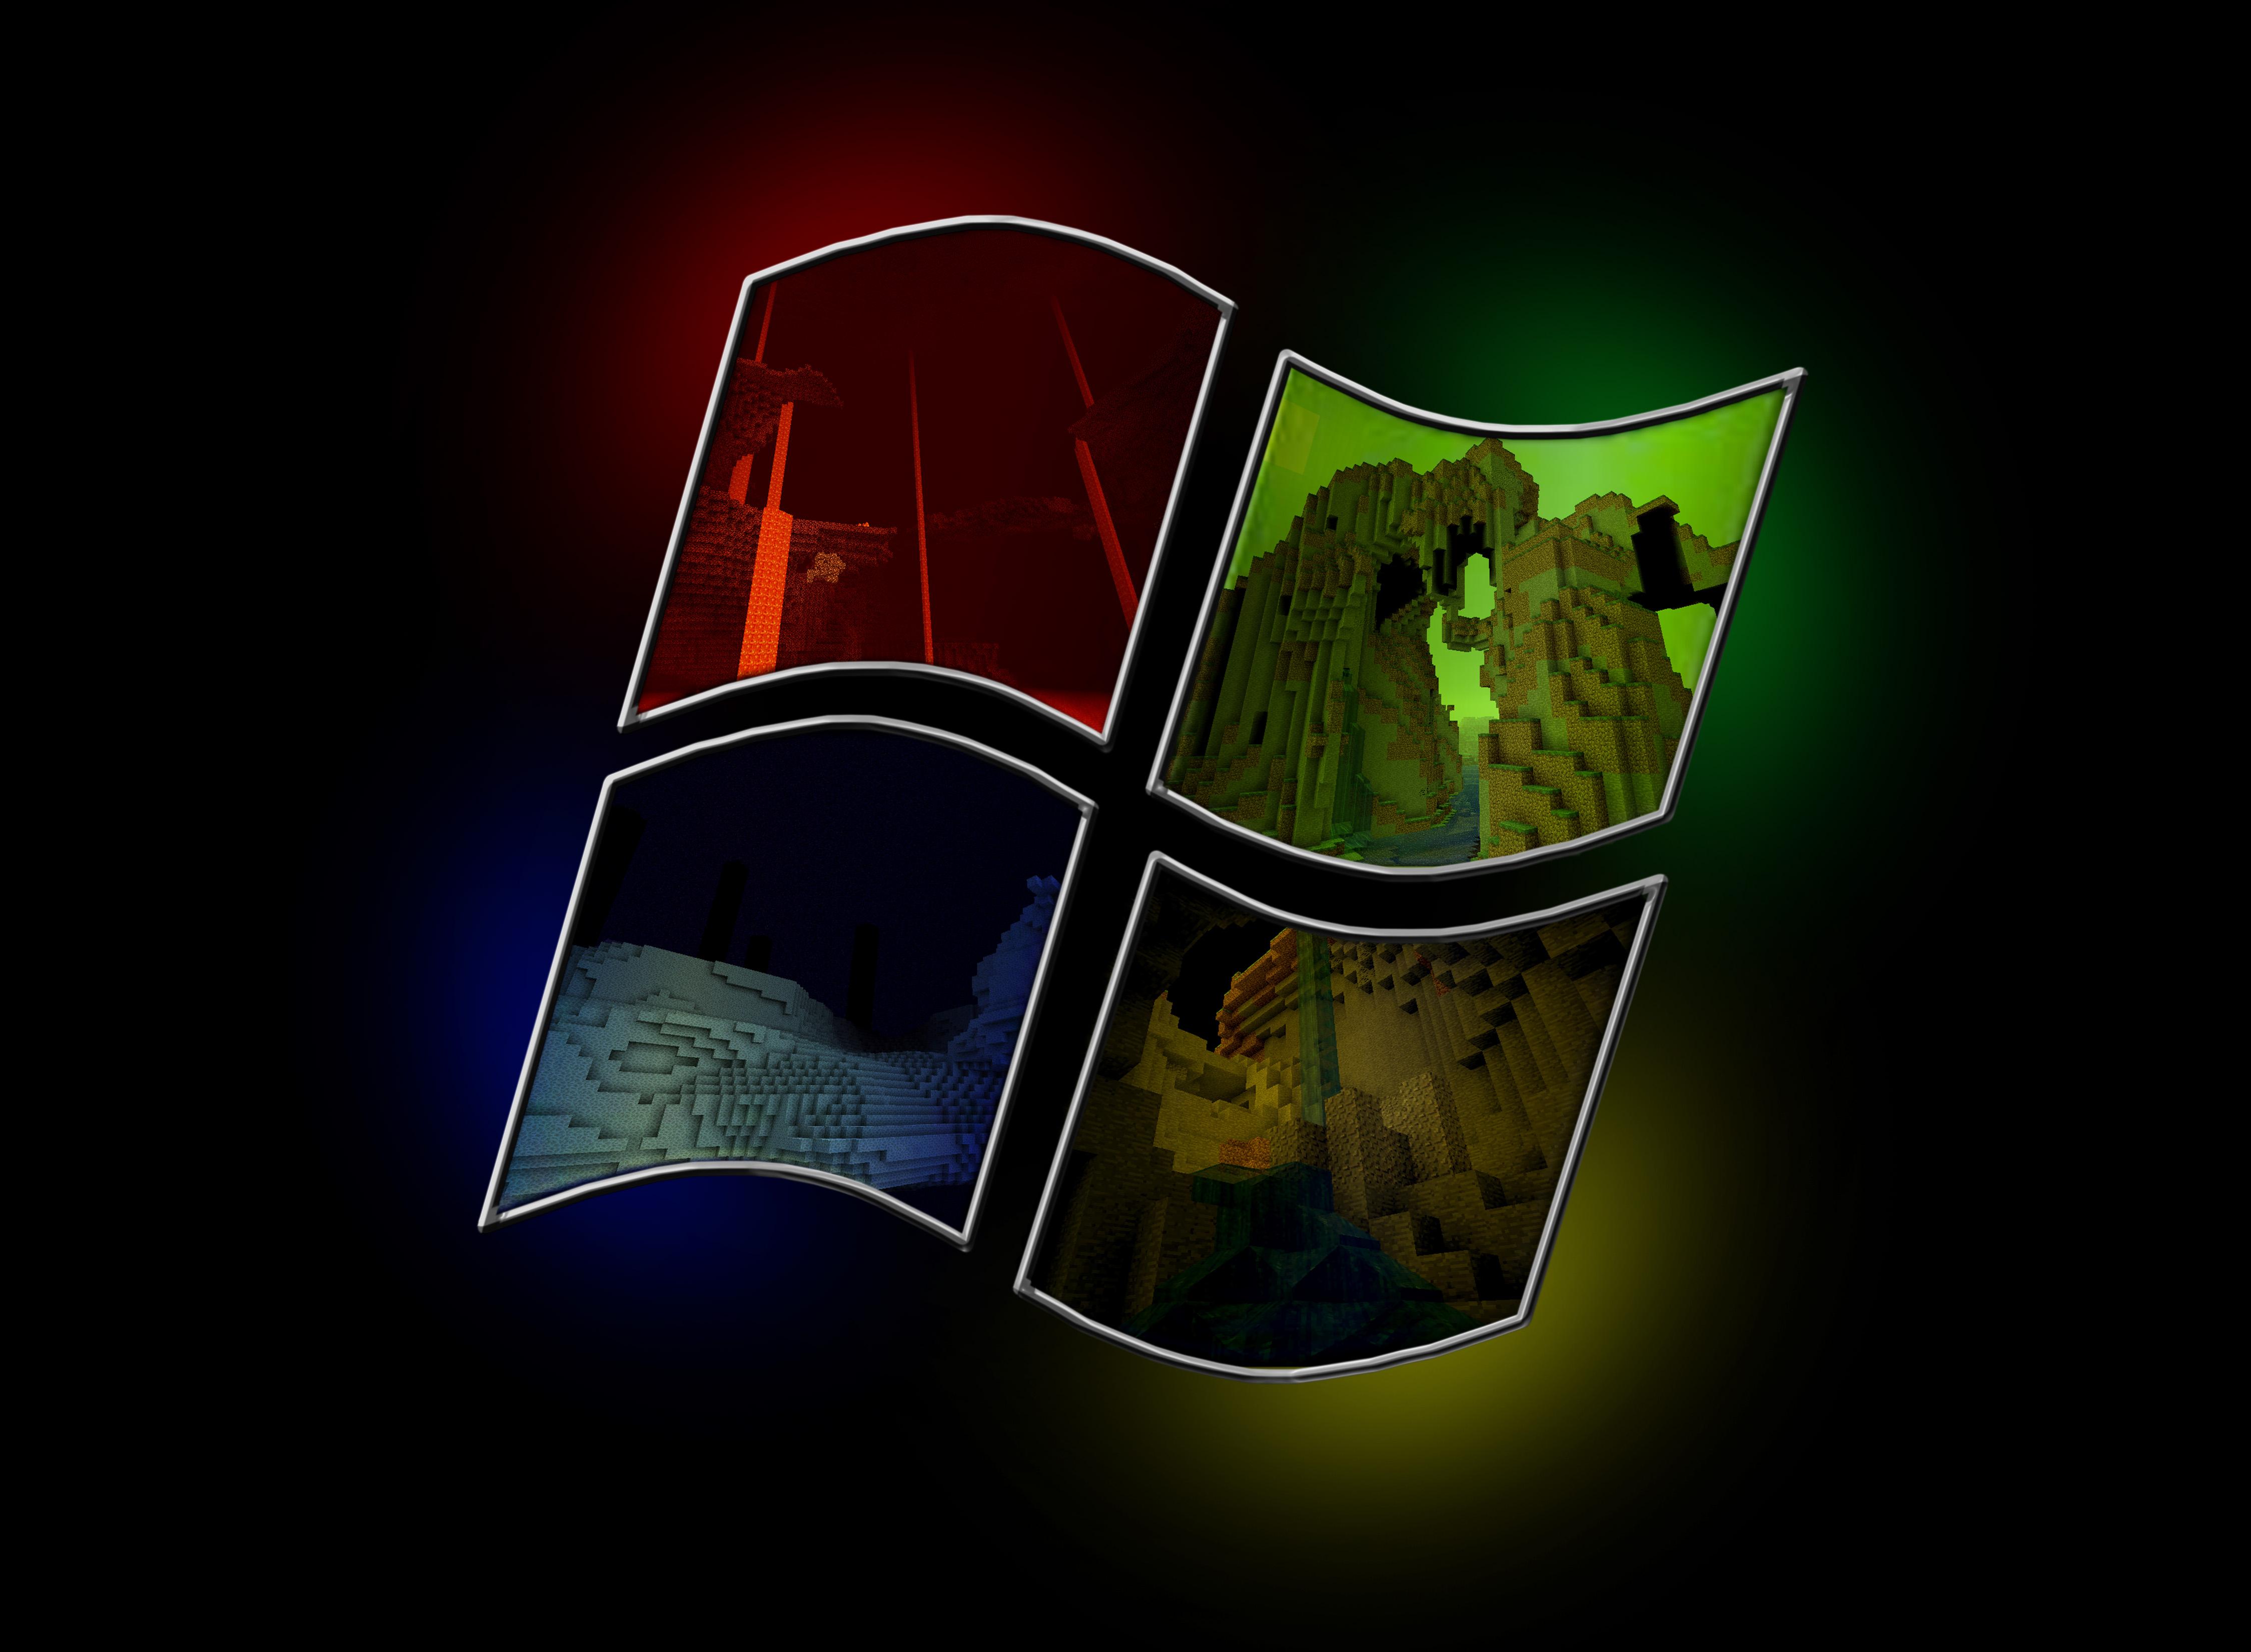 Minecraft Desktop Wallpaper Windows 8 - WallpaperSafari